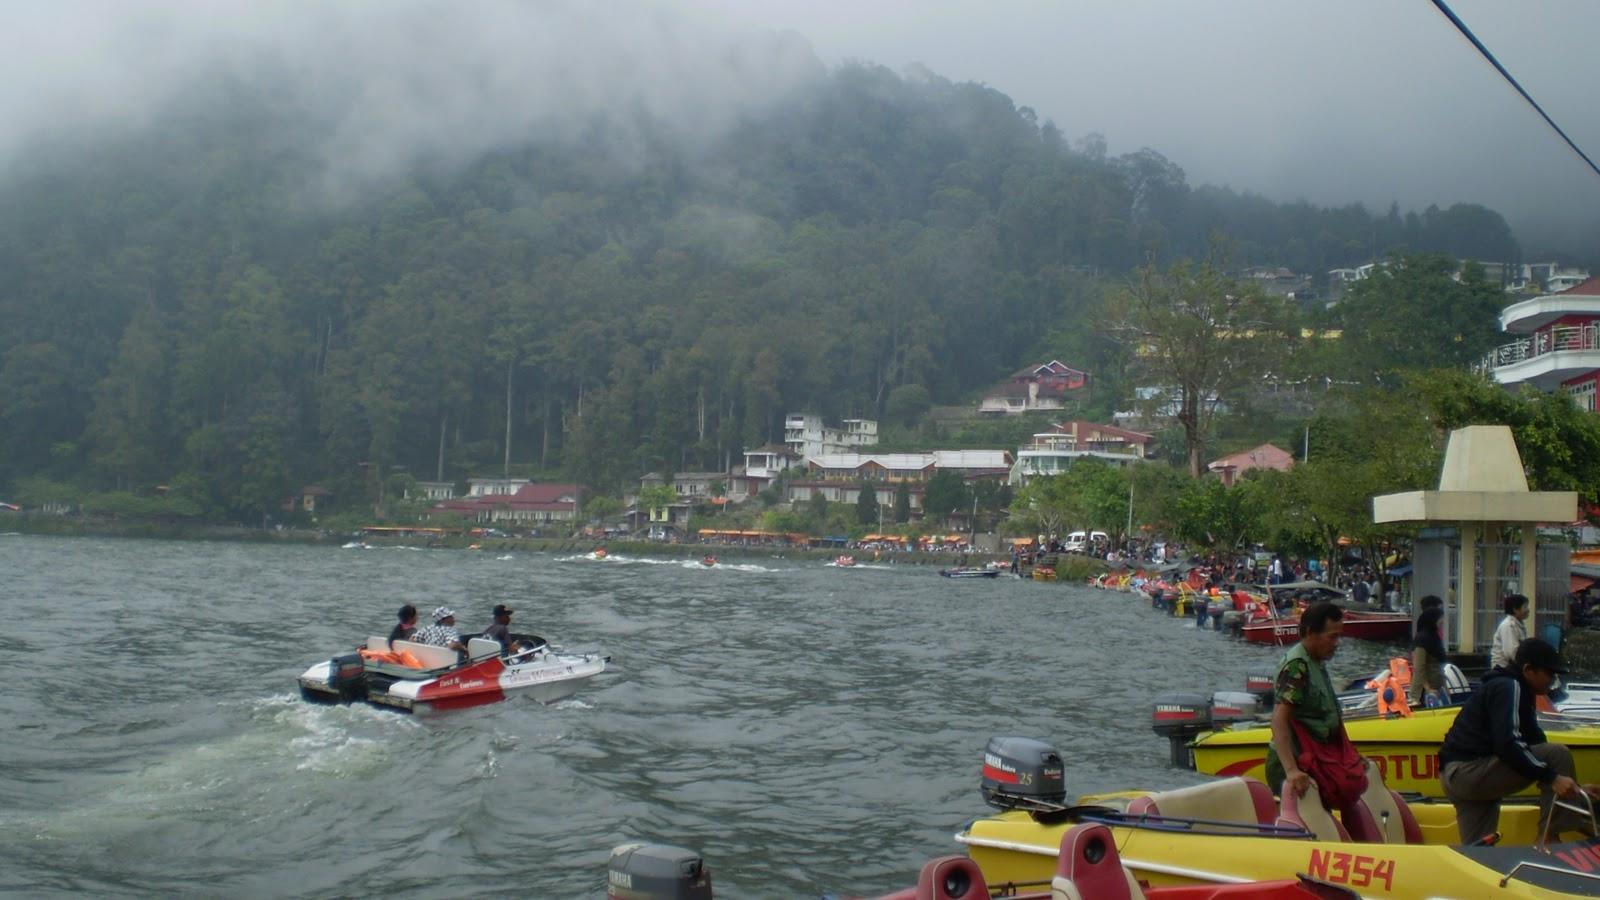 Inilah Deretan Wisata Paling Populer di Magetan Jawa Timur